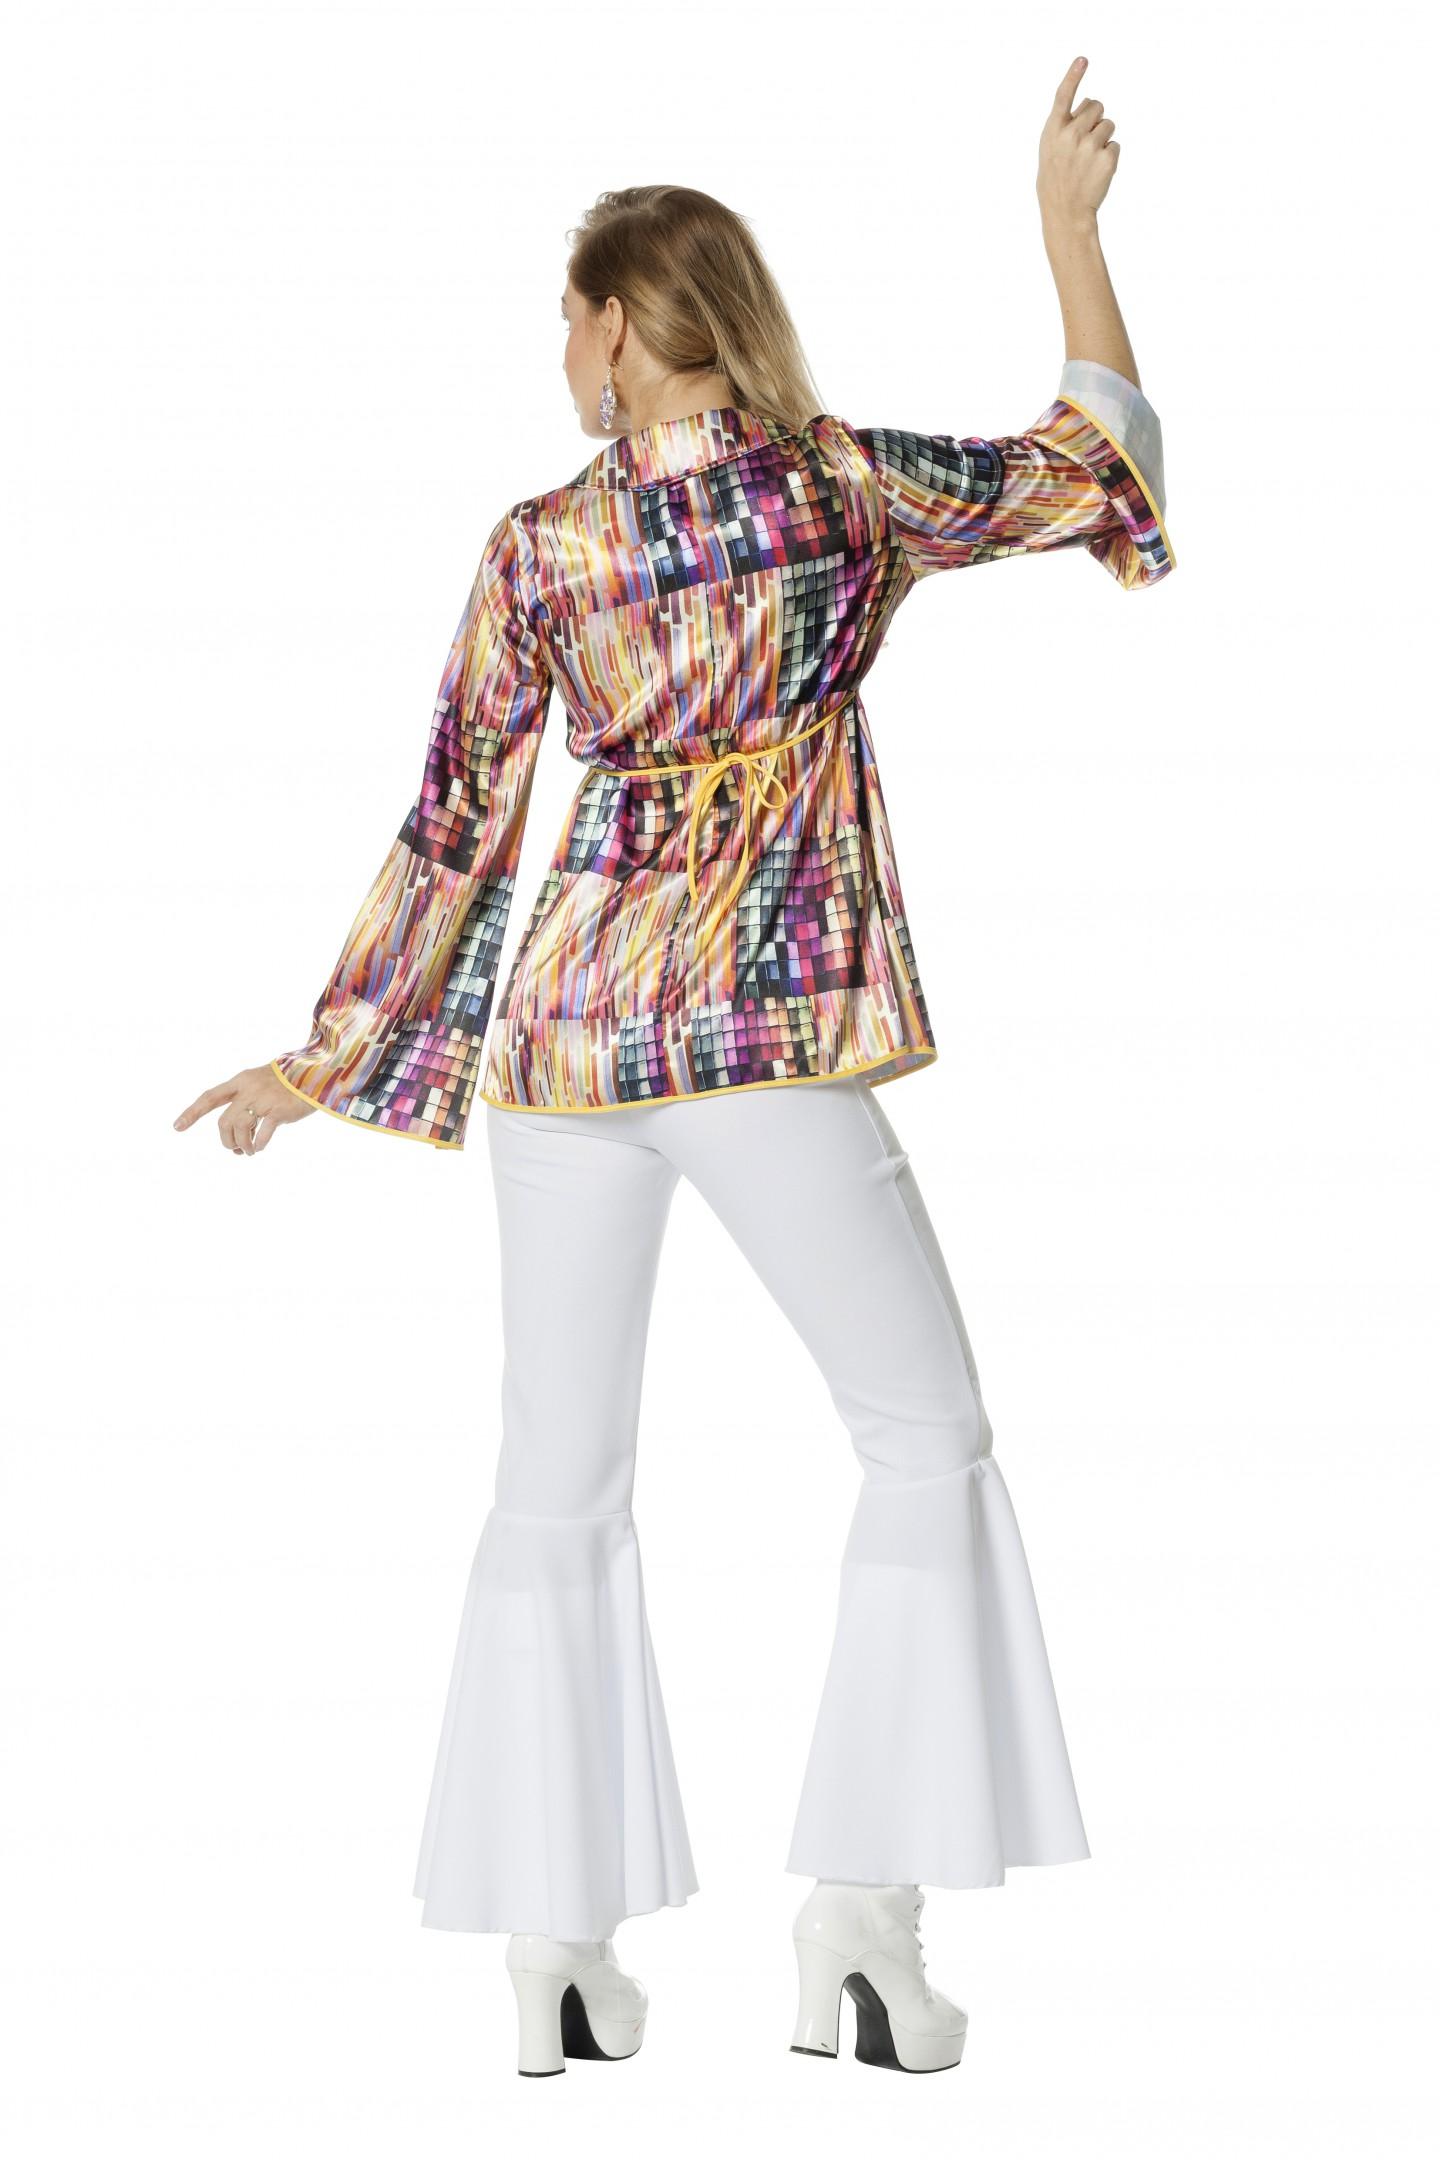 Disco shirt-226901